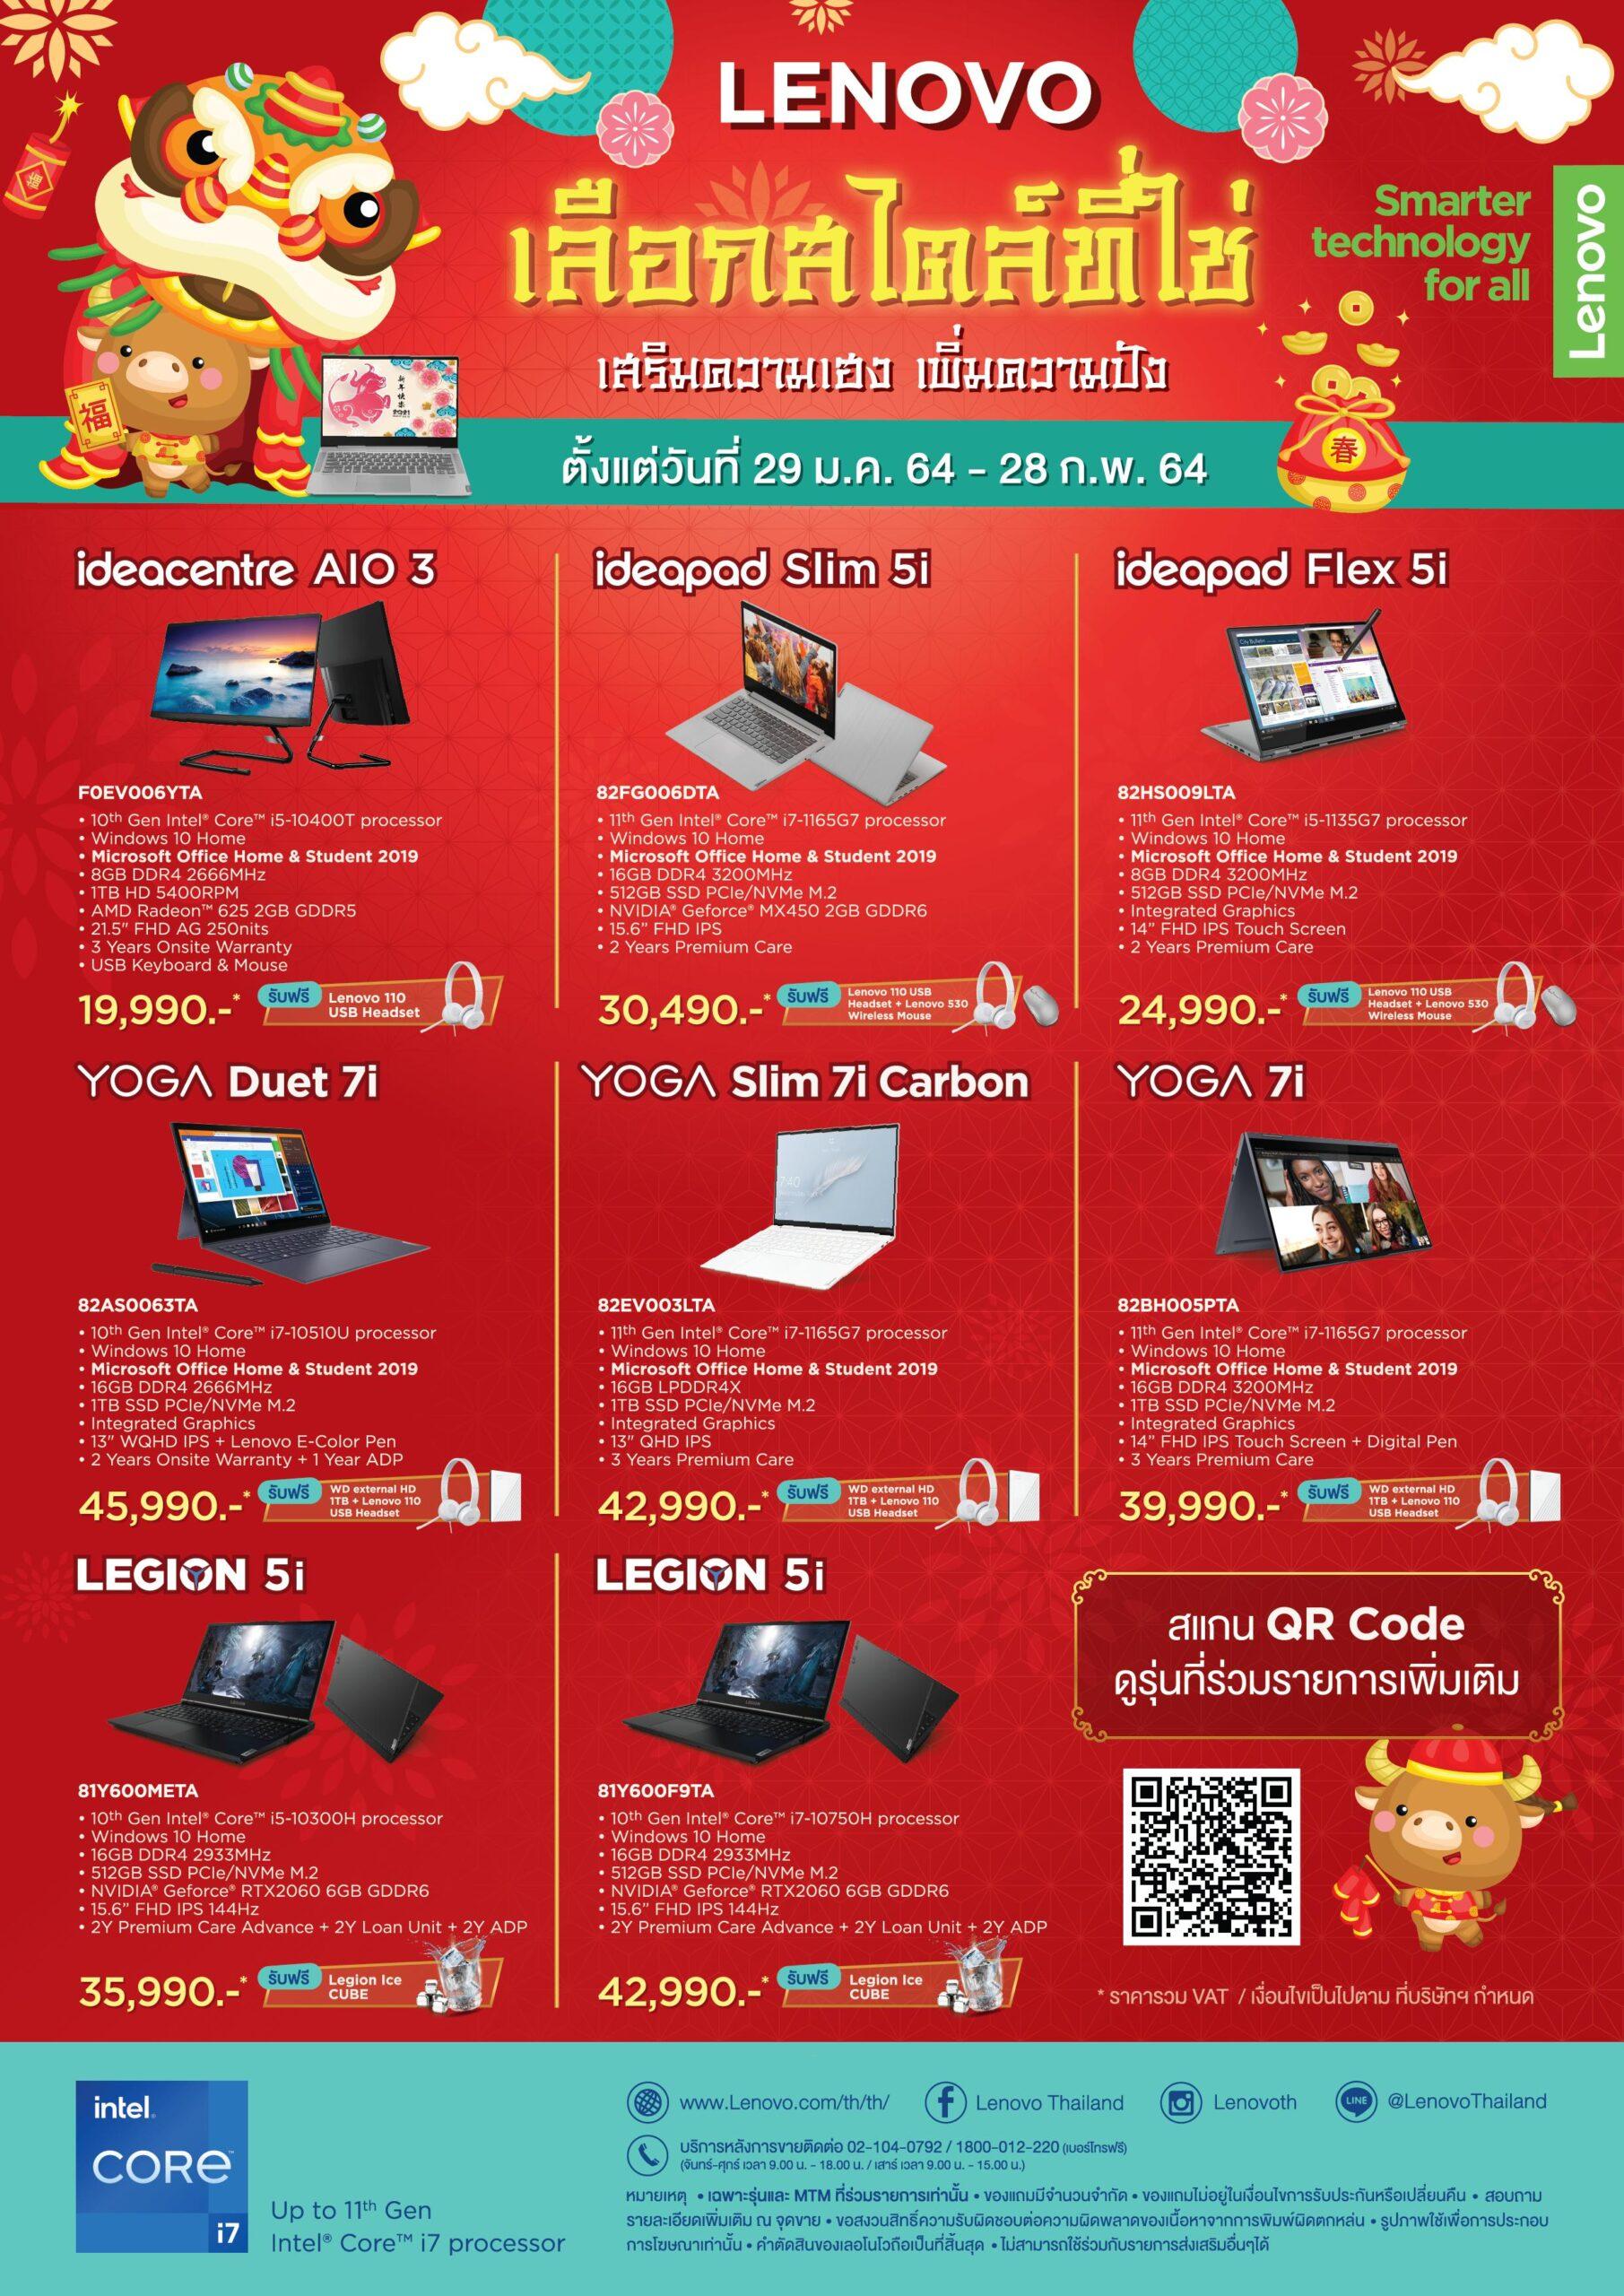 LeafletA4 CNY2021 Cre 02 scaled